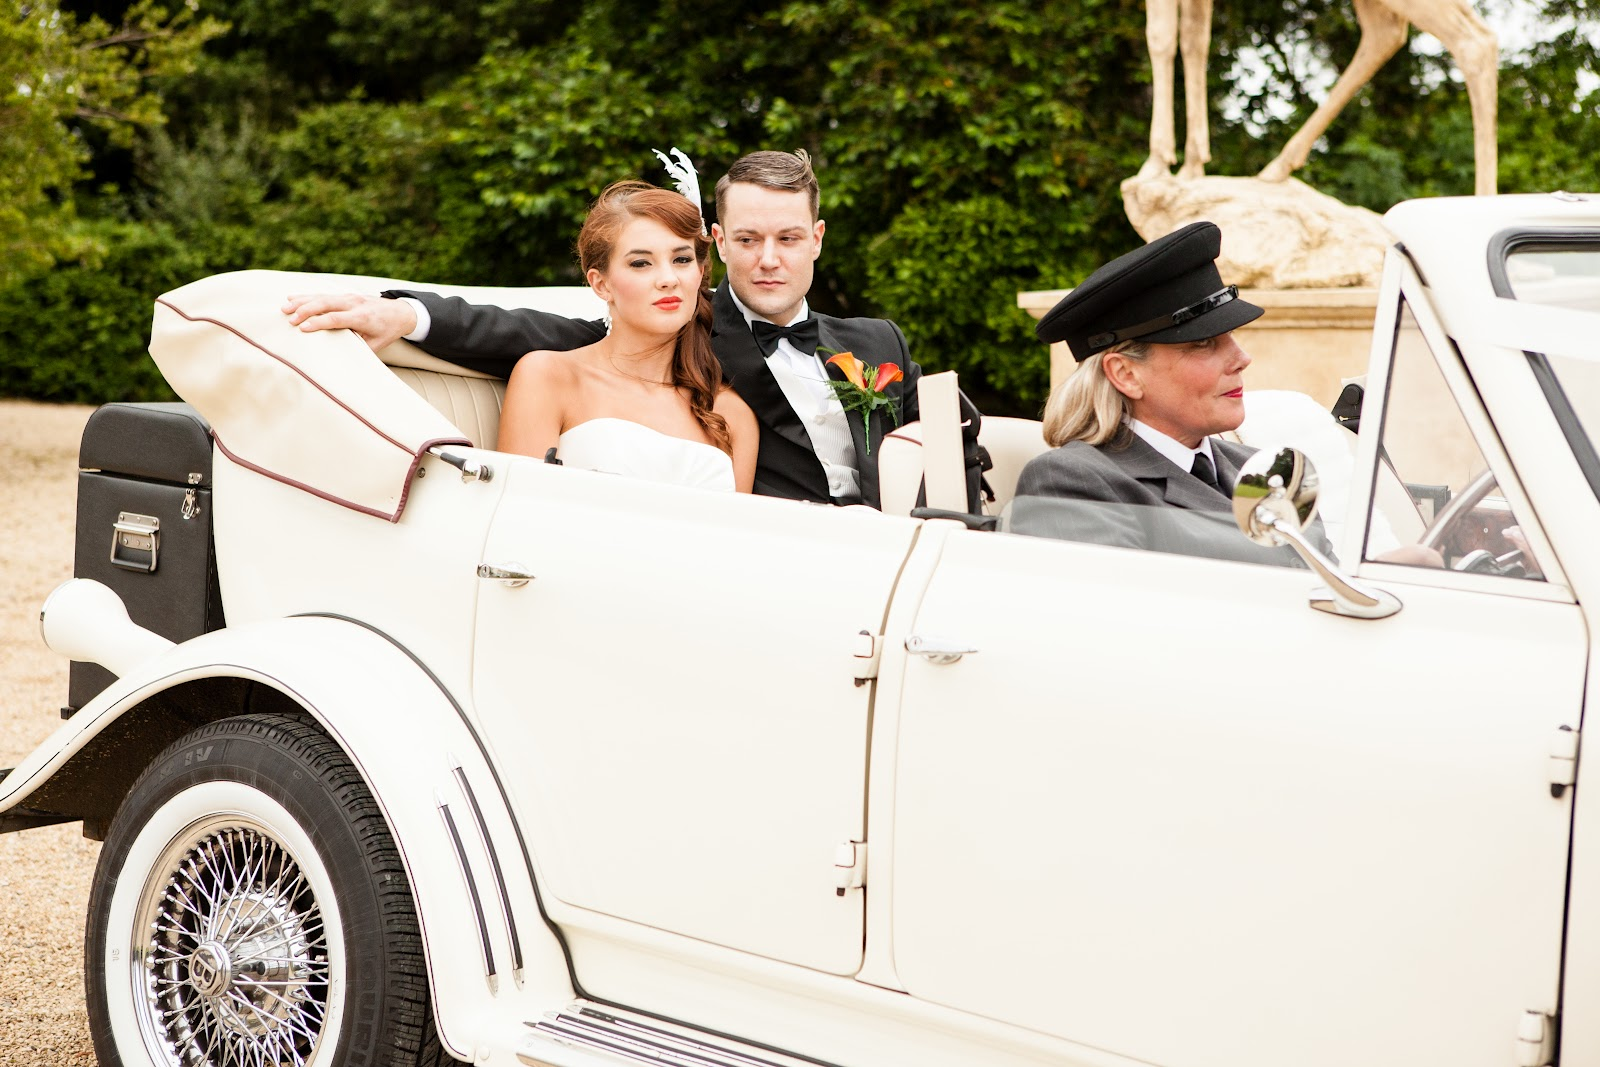 Englands Finest Wedding Cars Bristol: Photoshoot in West Weddings ...